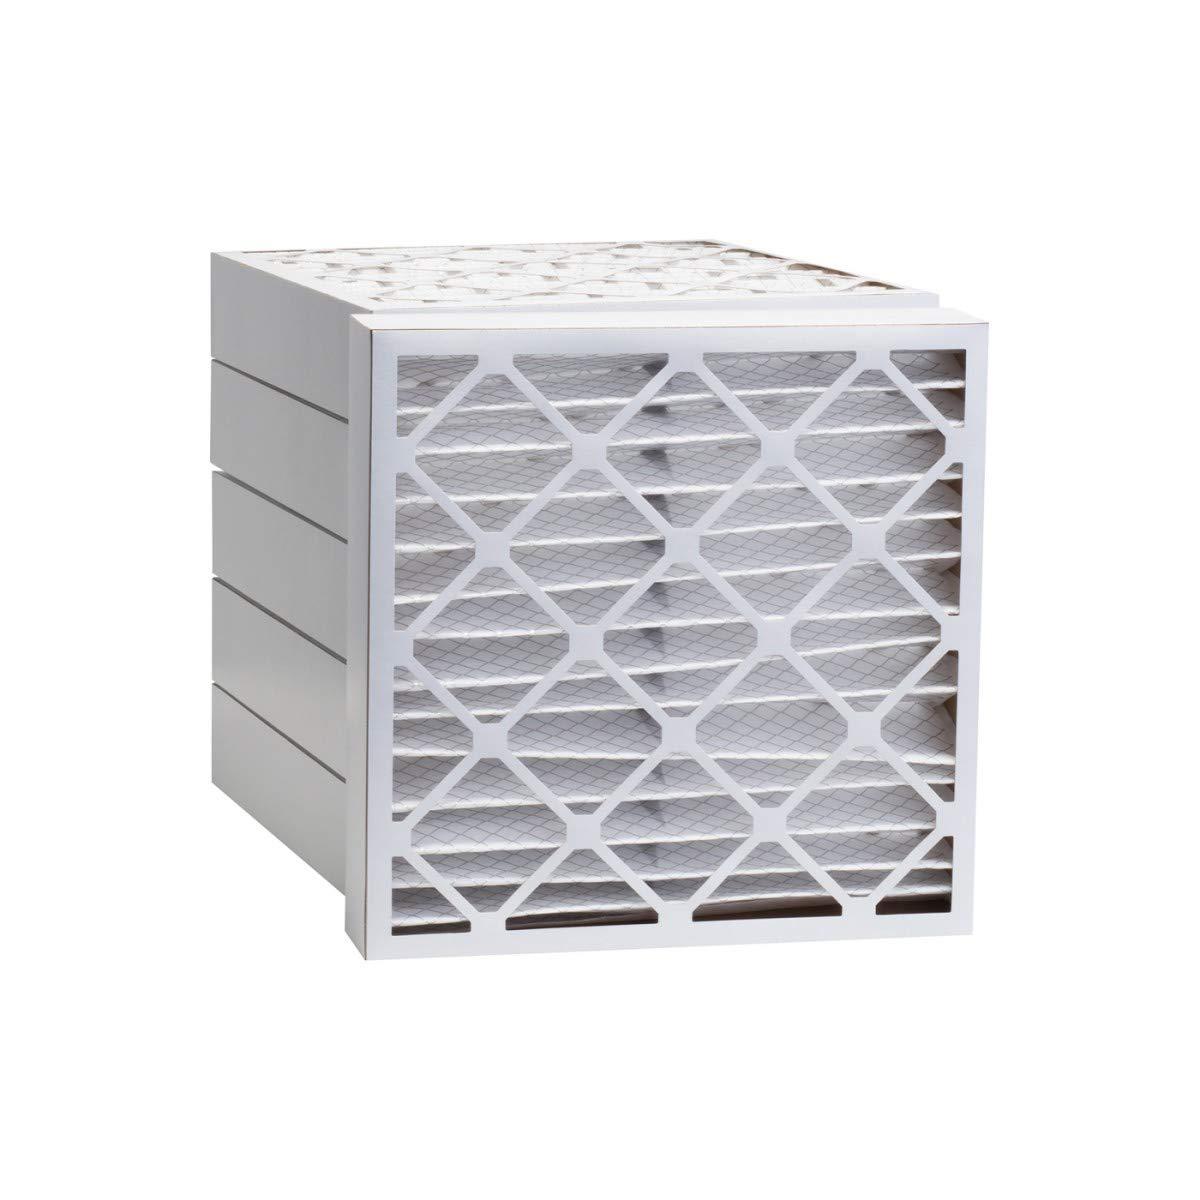 Assigned by Sterling Seal & Supply, (STCC) HI-20x20x4x6CS.DSC 20x20x4, Furnace Air Filter, Purolator Hi-E 40 Extended Surface, Mechanical MERV 8, 19-1/2''L x 19-1/2''H x 3-3/4''D - DSC - CASE (Pack of 6)